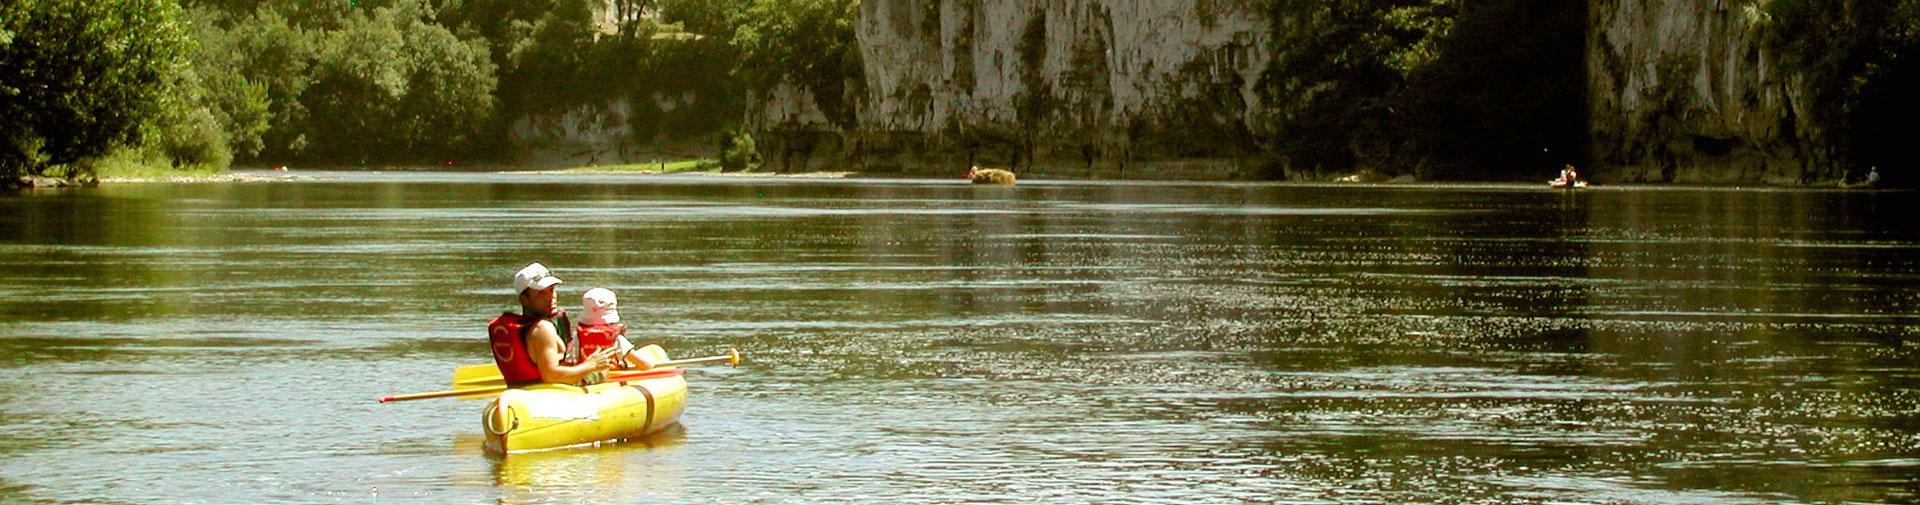 mirandol-sejour-canoe-vallee-de-la-dordogne-lot